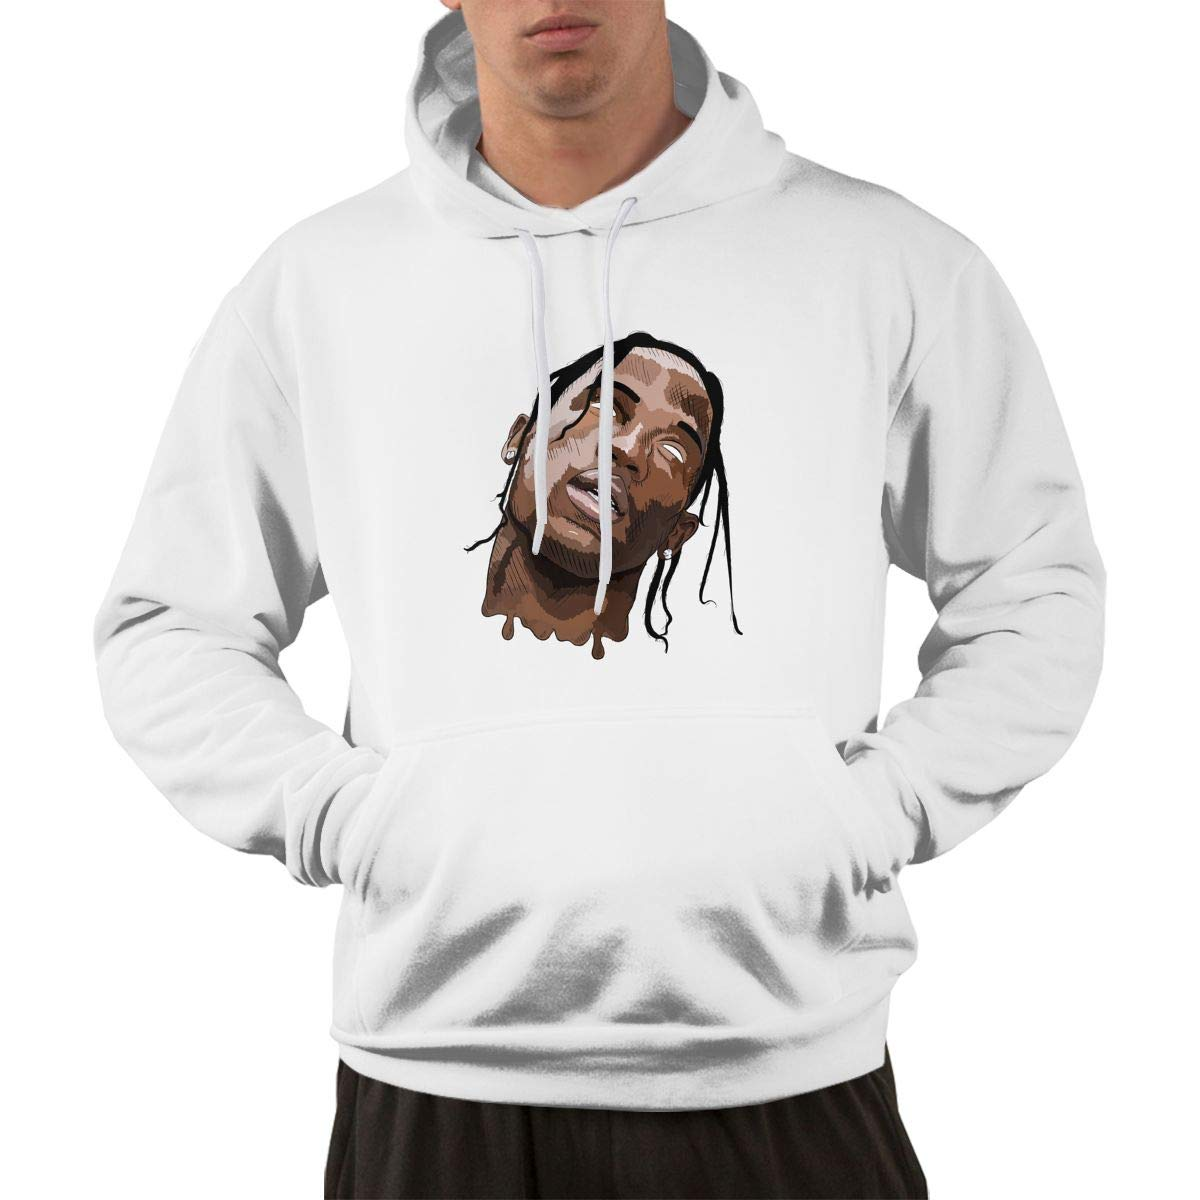 d6a6bd6cc99f Zinmmerm Men's Fashion Travis-Scott- Travis-La-Flame Hooded Sweatshirt  39a76b